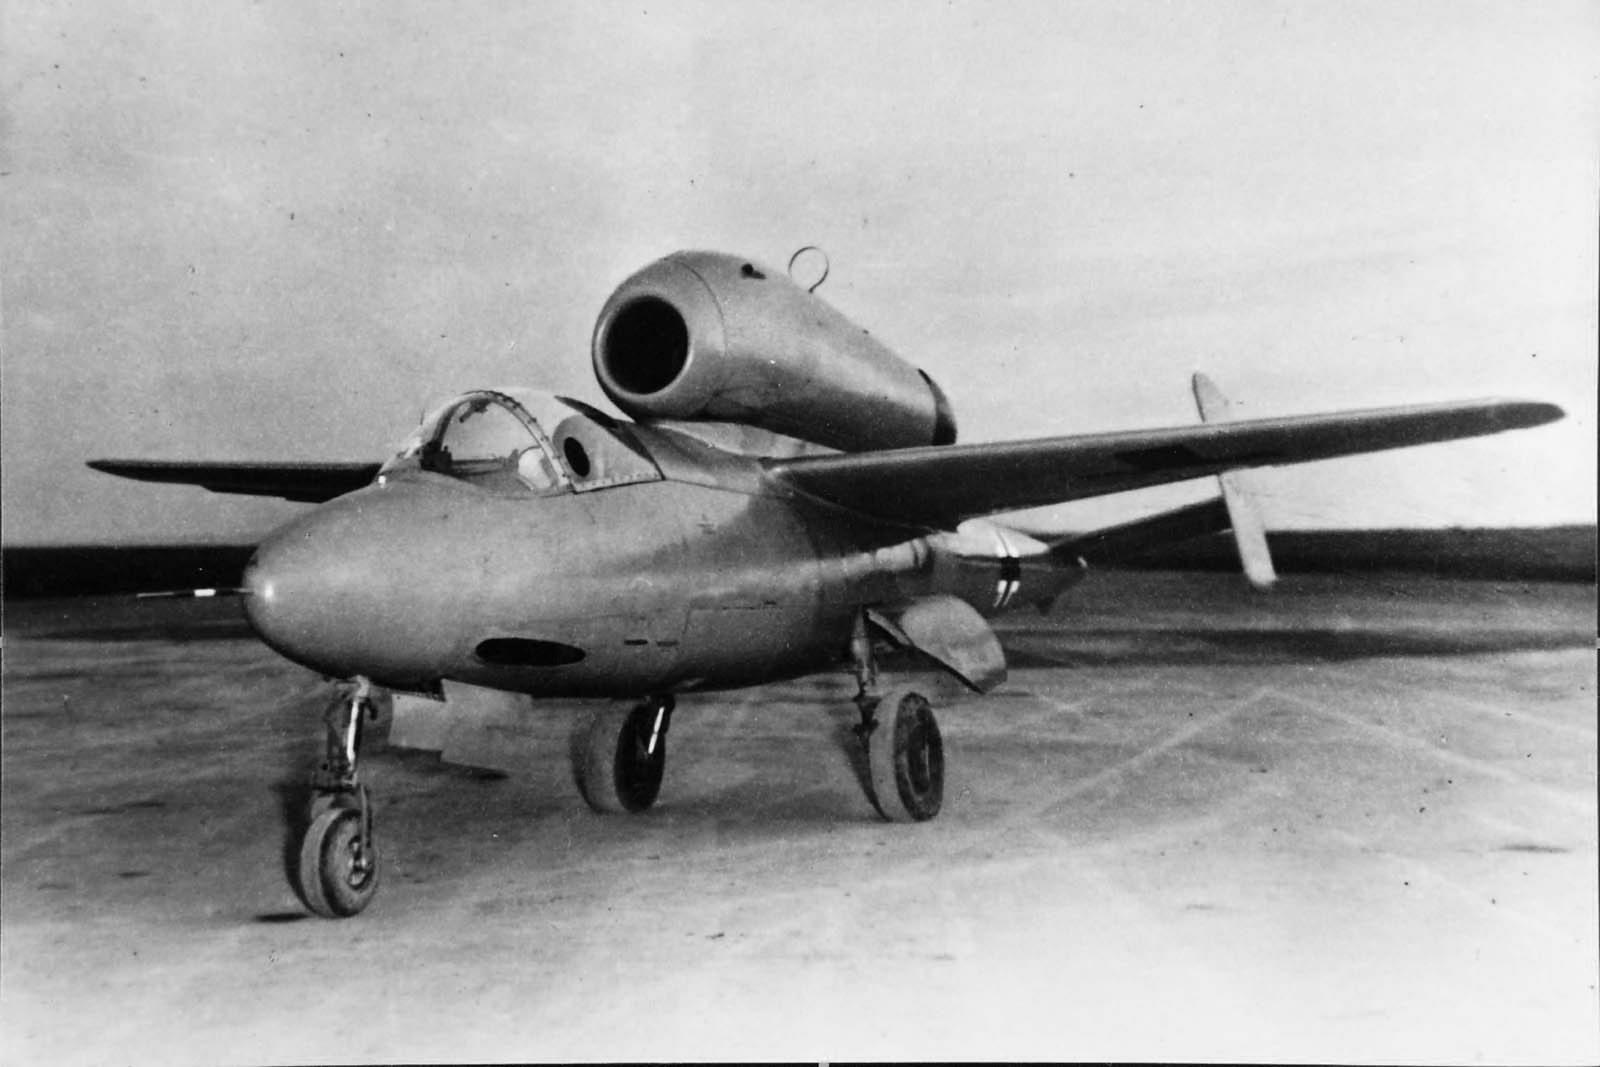 Heinkel He162 V-1 prototype W.Nr. 200 001